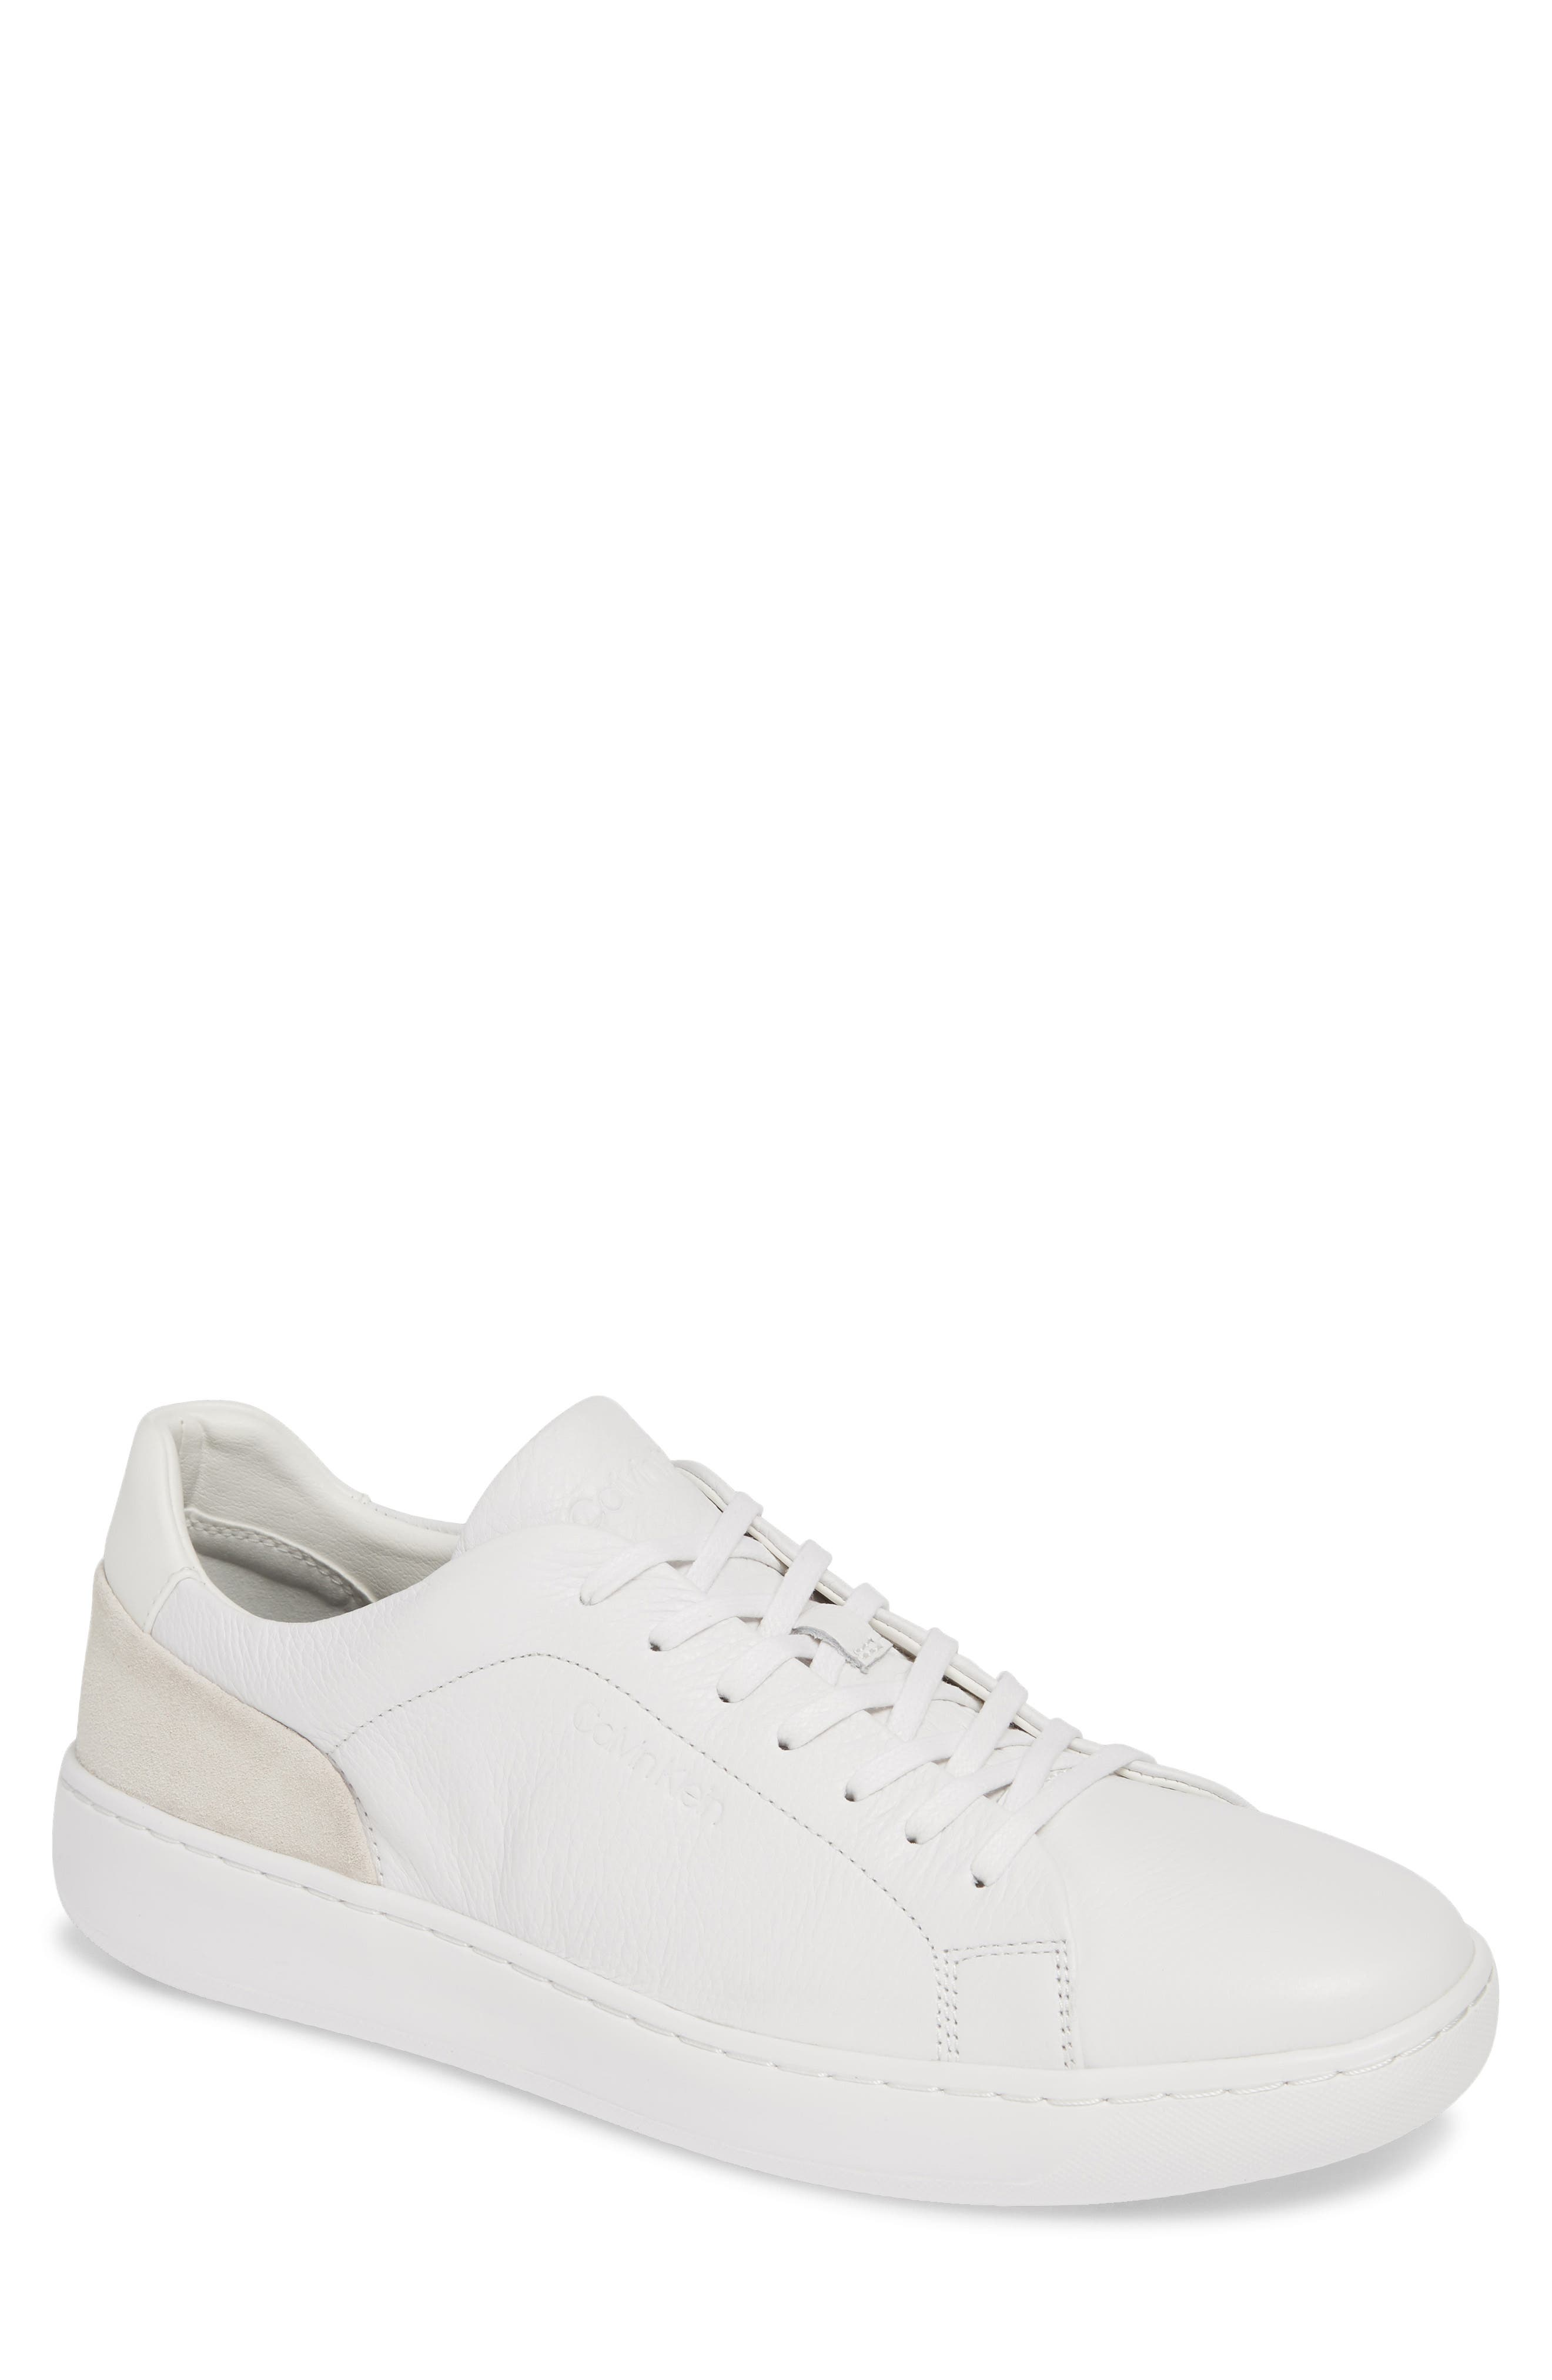 Calvin Klein Fuego Sneaker, White